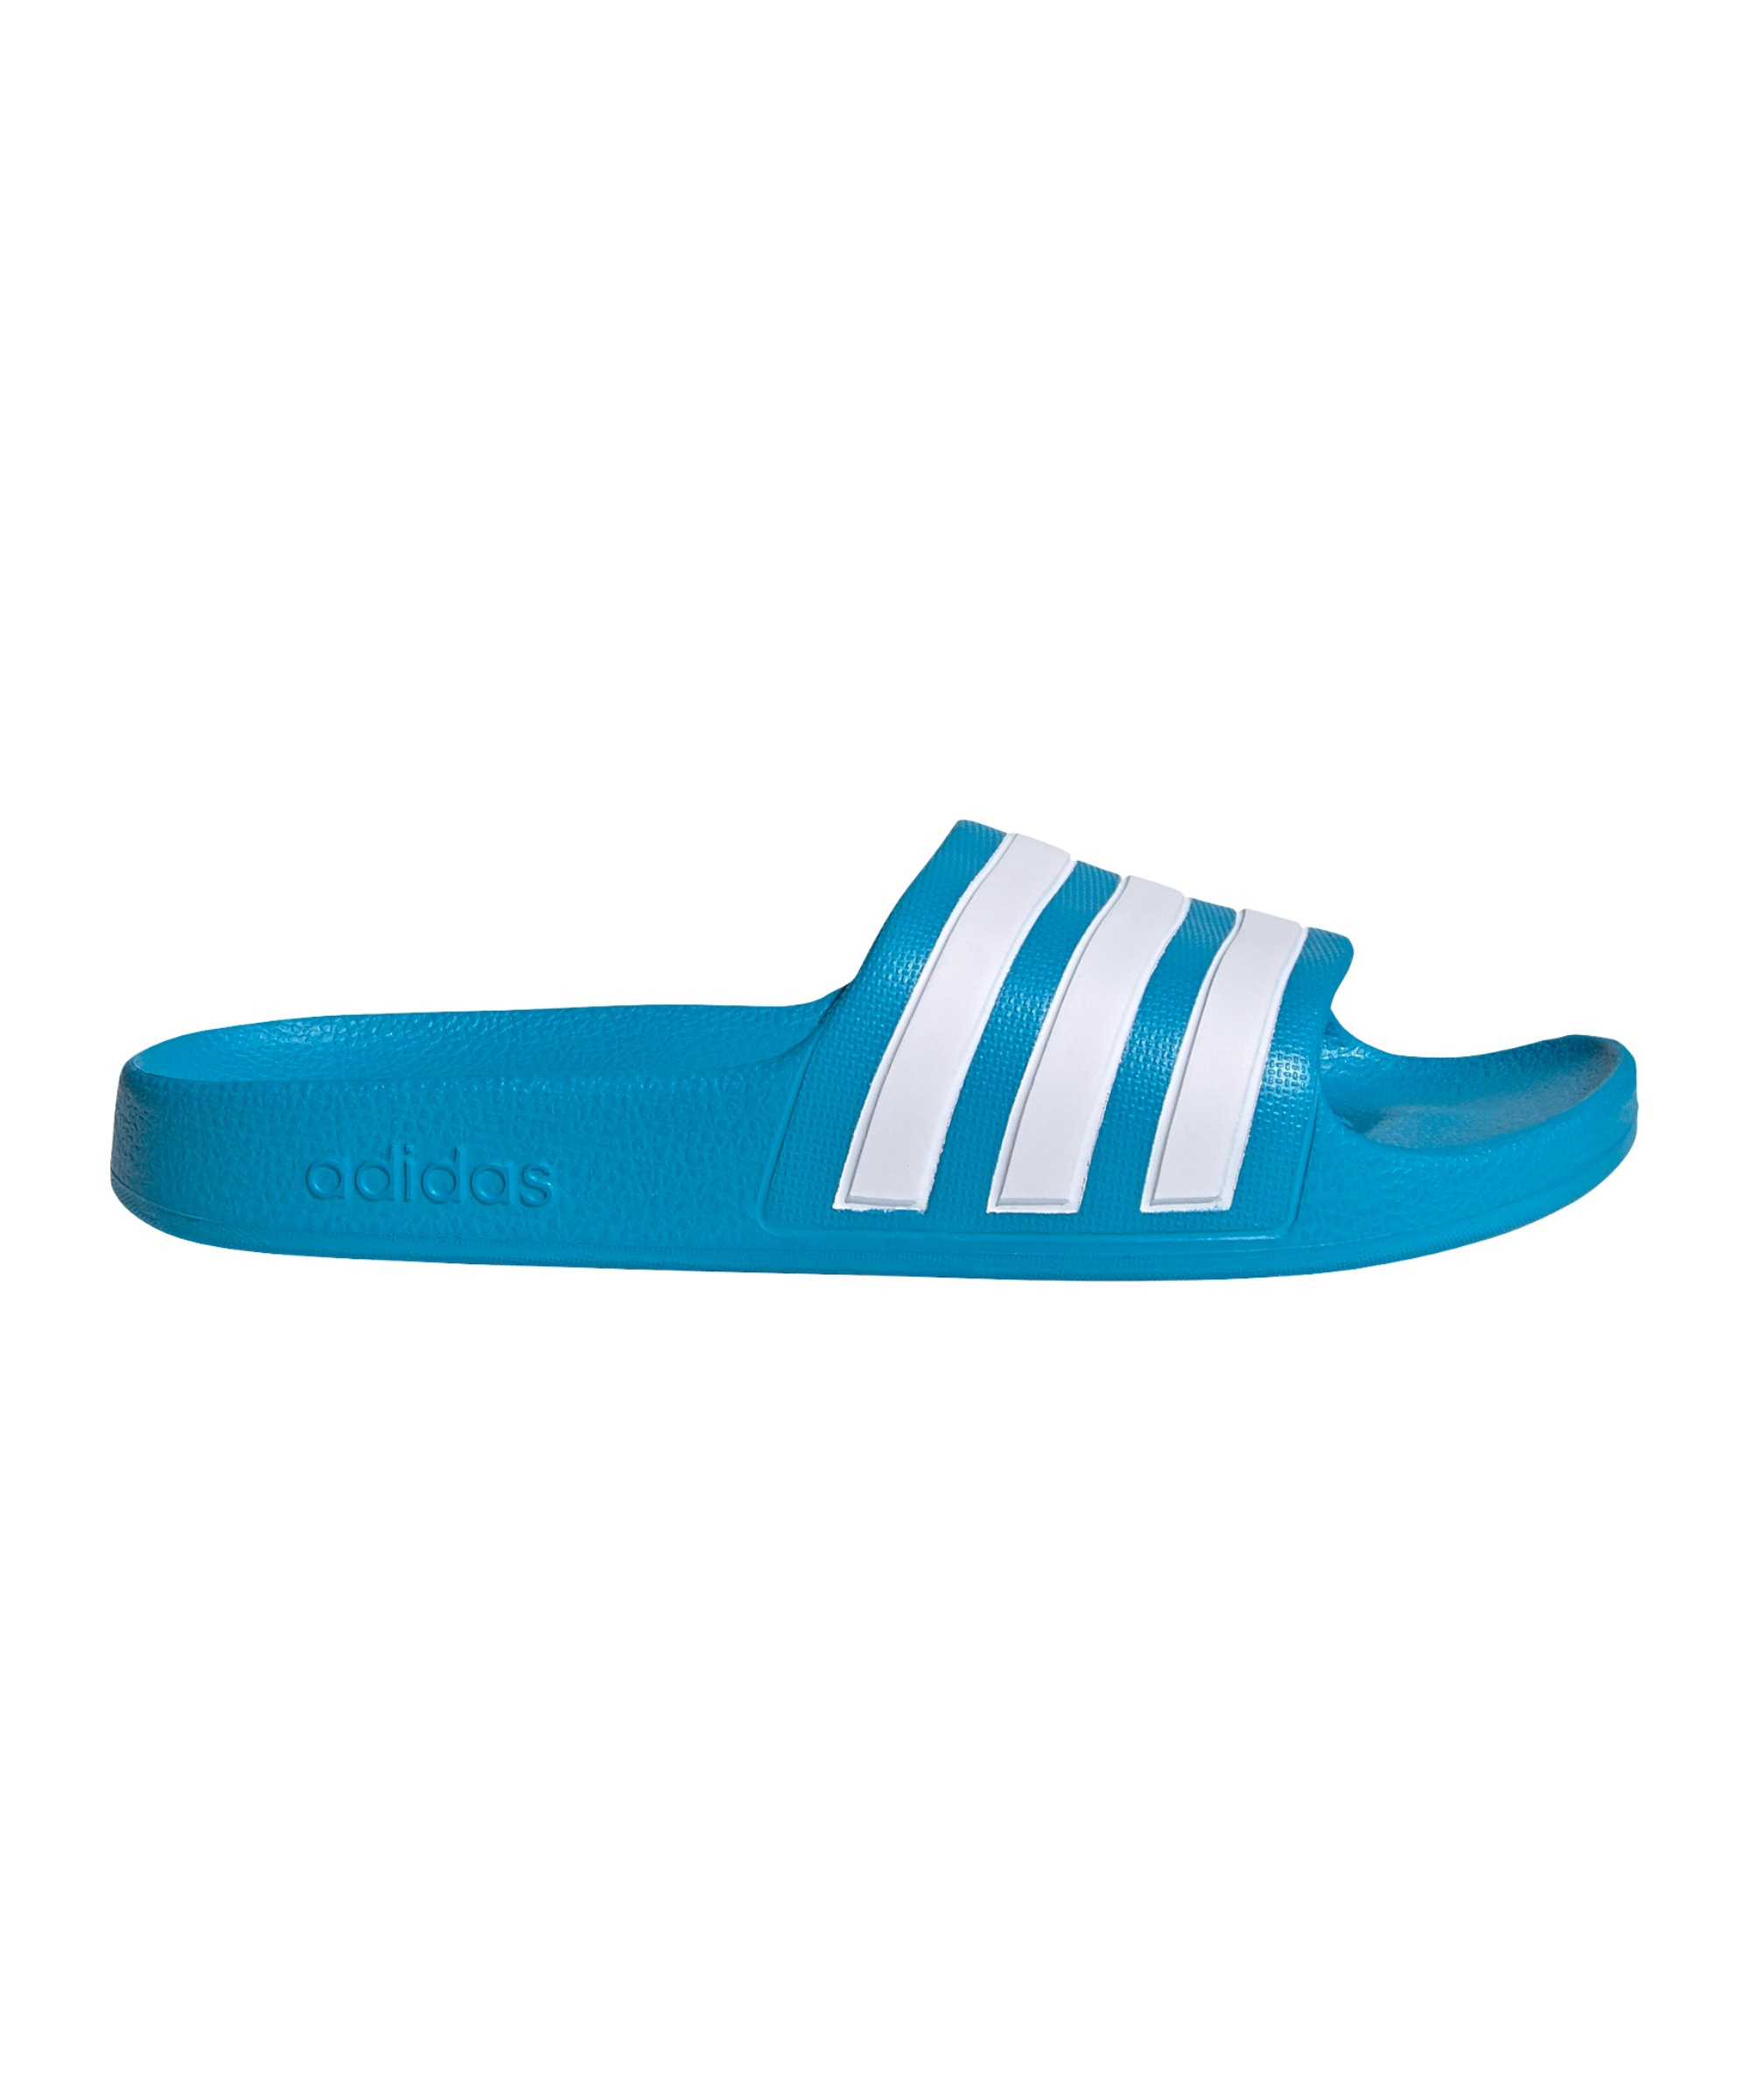 adidas Adilette Aqua Badelatsche Kids Blau - blau